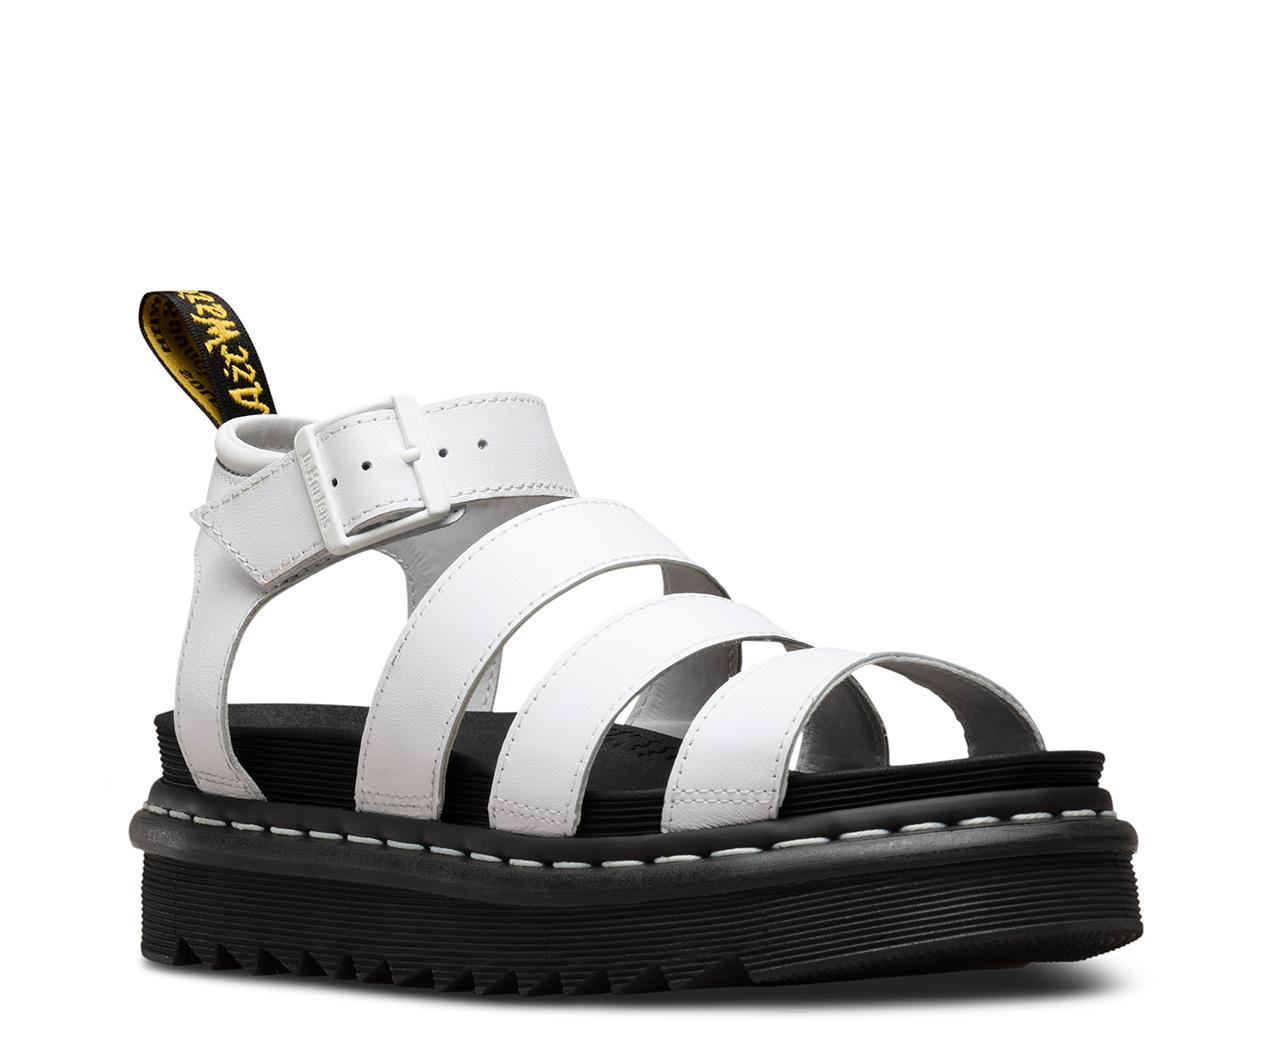 61dbb6855a6a1 BLAIRE SOFTY T | Sandals | Dr. Martens Official